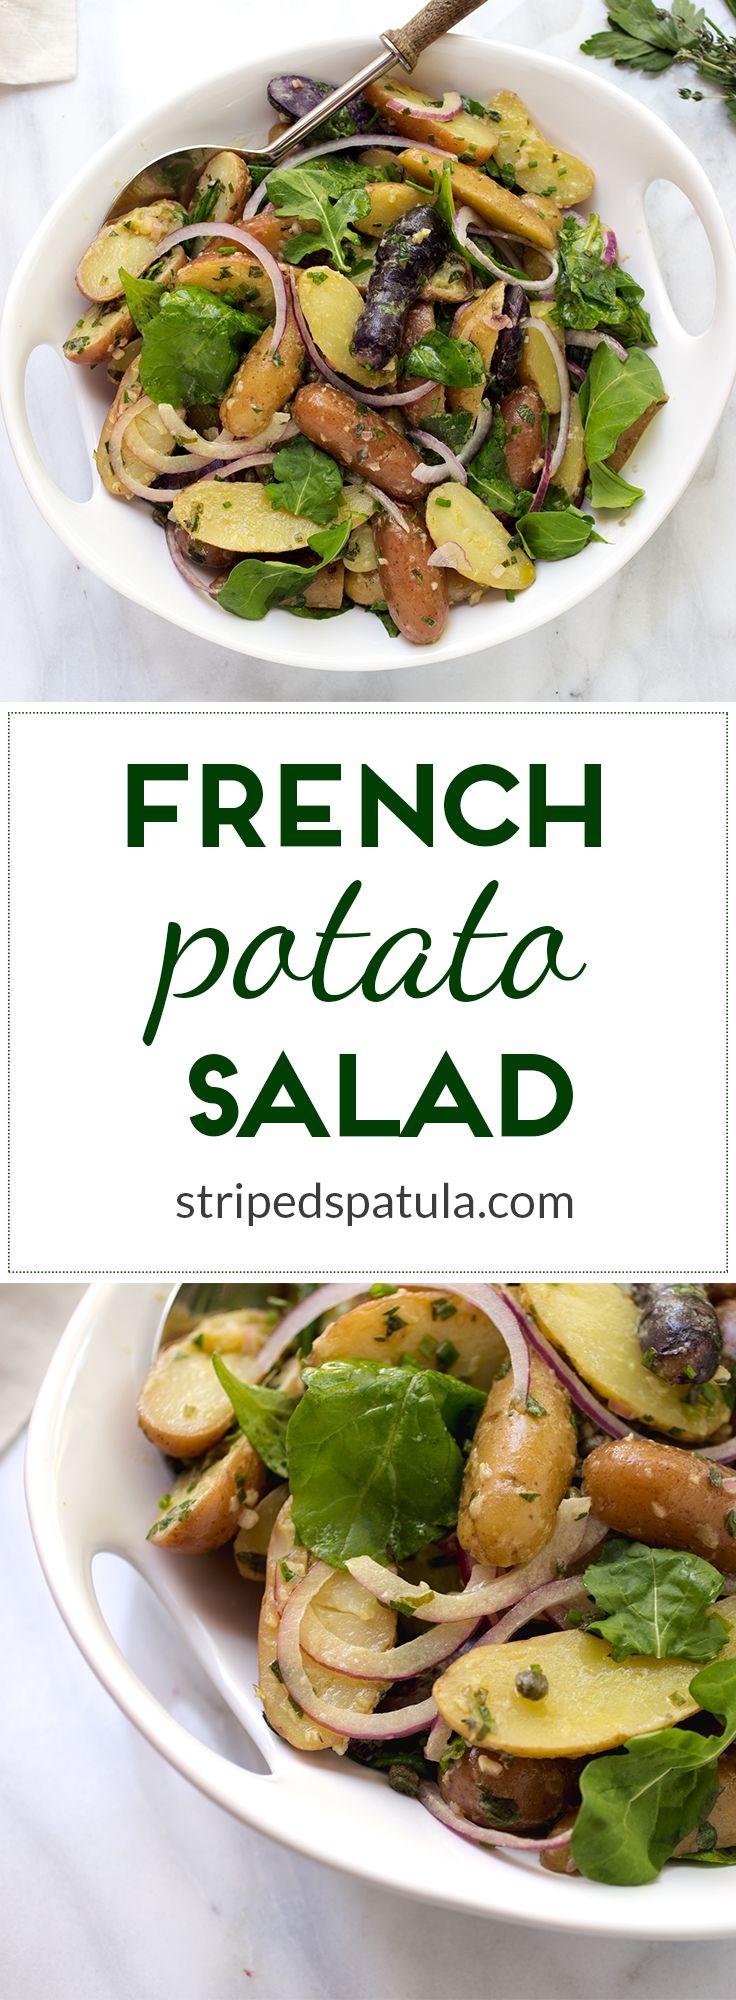 1000+ images about Potatoes?& corn recipes on Pinterest | Potato salad ...